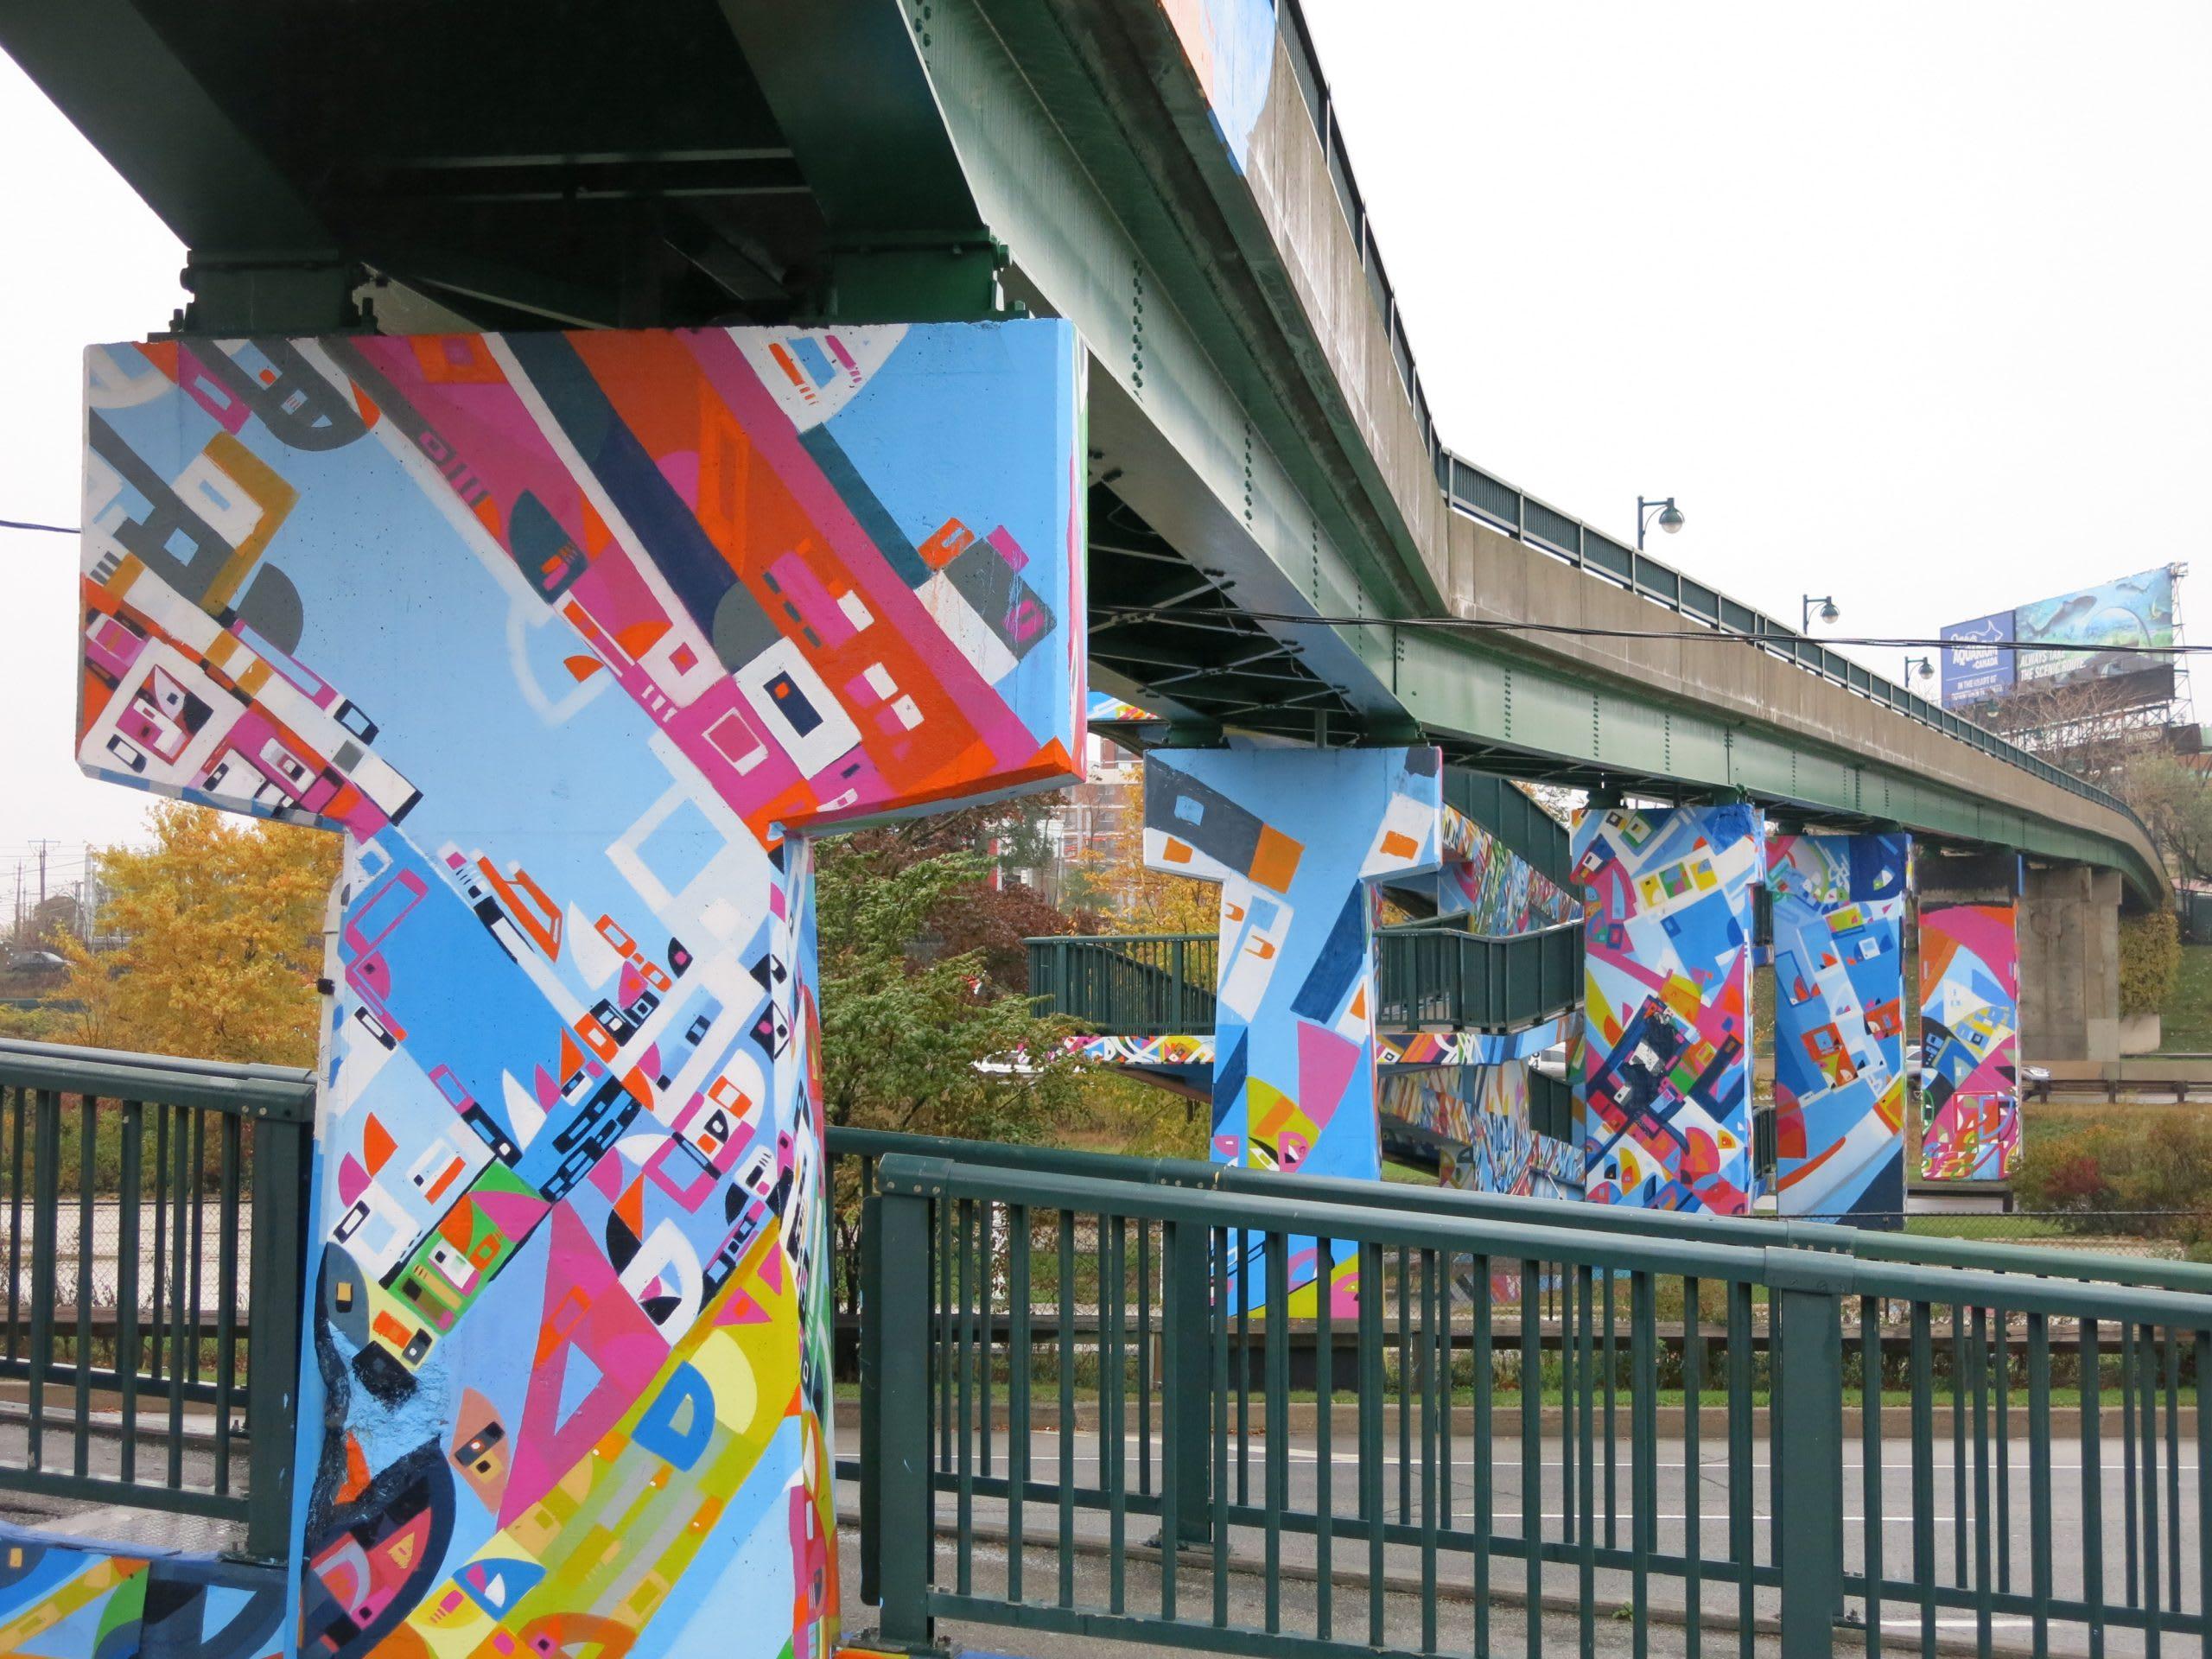 Toronto – Roncesvalles Pedestrian Bridge